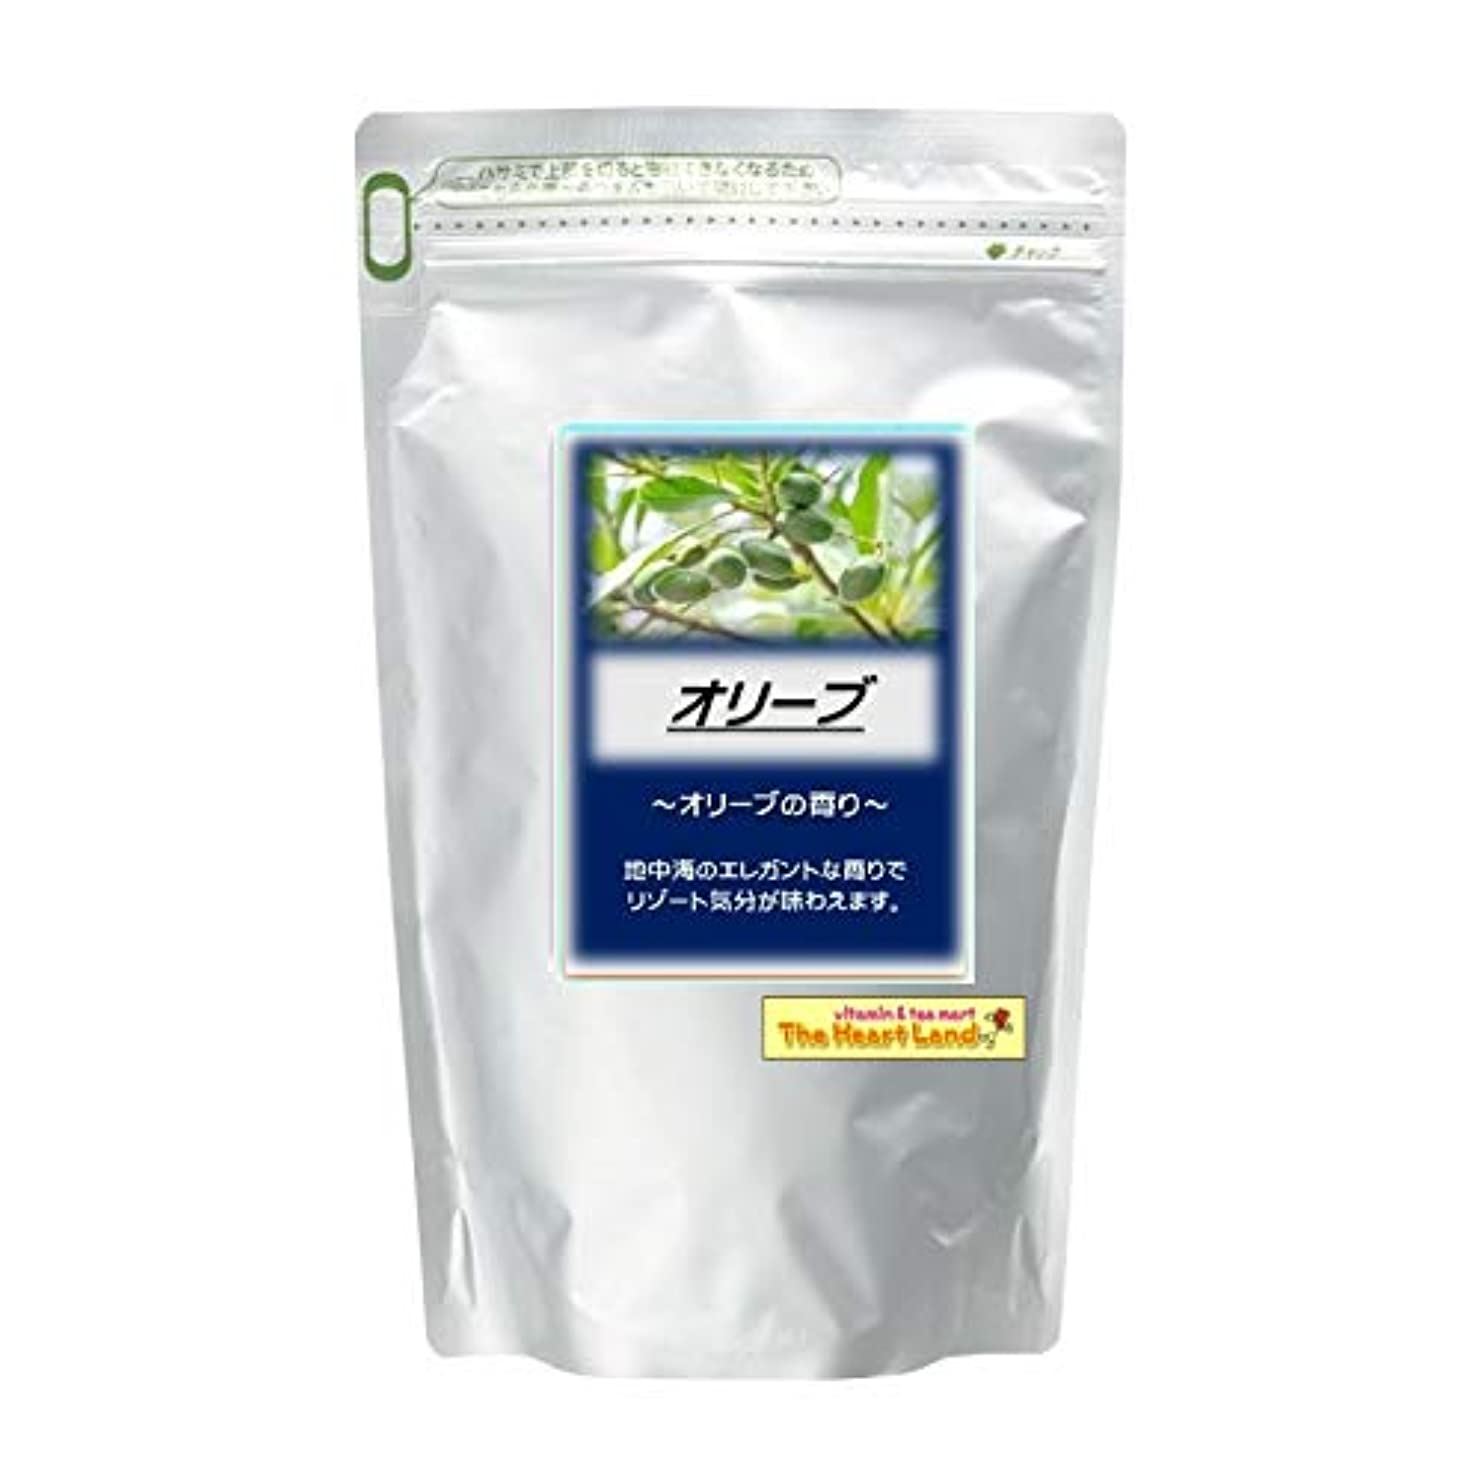 構造宴会文化アサヒ入浴剤 浴用入浴化粧品 オリーブ 2.5kg